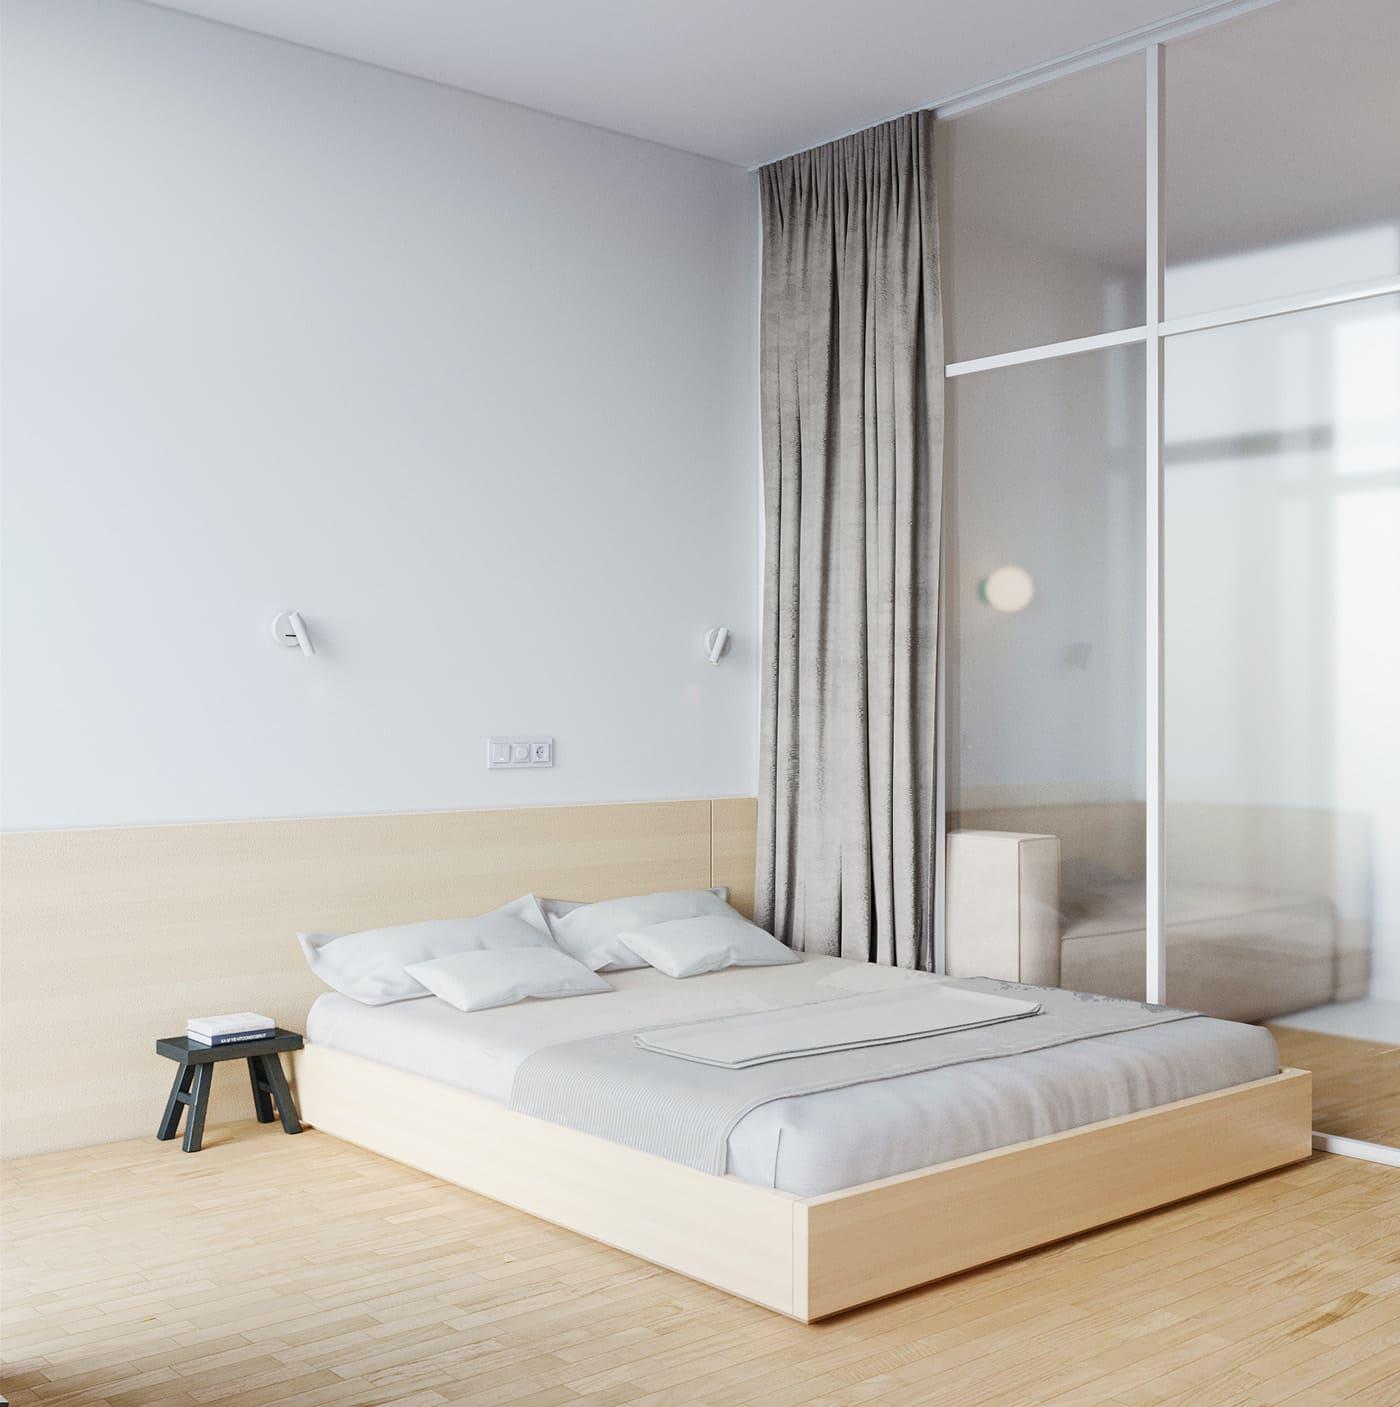 модный дизайн интерьера квартиры фото 31